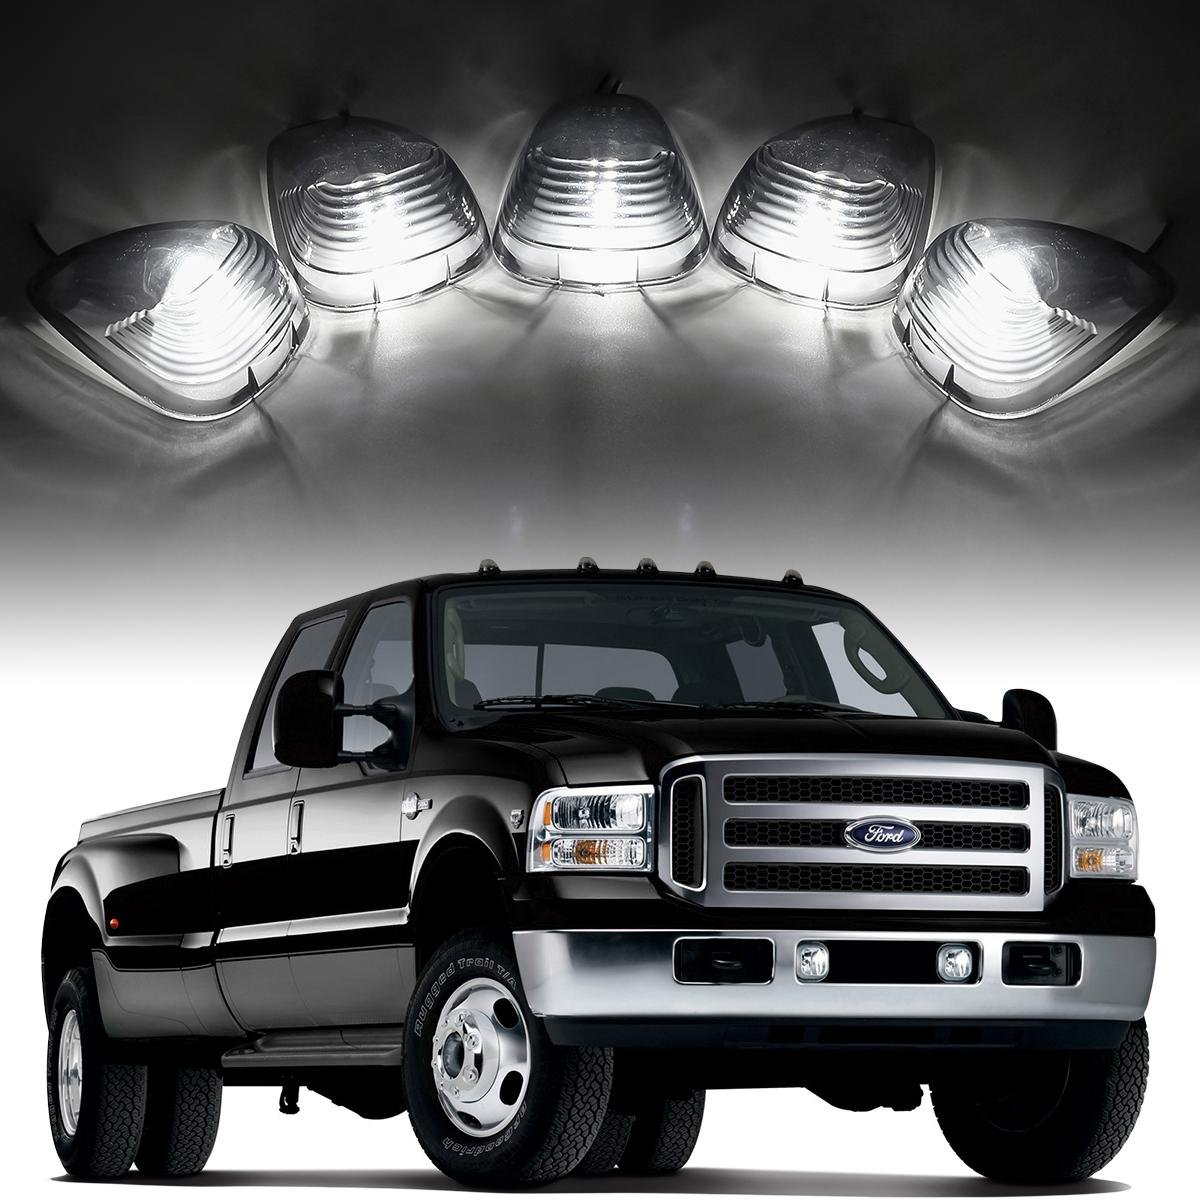 Partsam 5x Smoke Cab Roof Running Light Marker Light Lens +5xT10 6-5730 SMD HID Xenon White LED for 1999-2016 Ford E-150 E-250 E-350 E-450 F-150 F-250 F-350 F-450 F-550 F-650 F-750 Super Duty